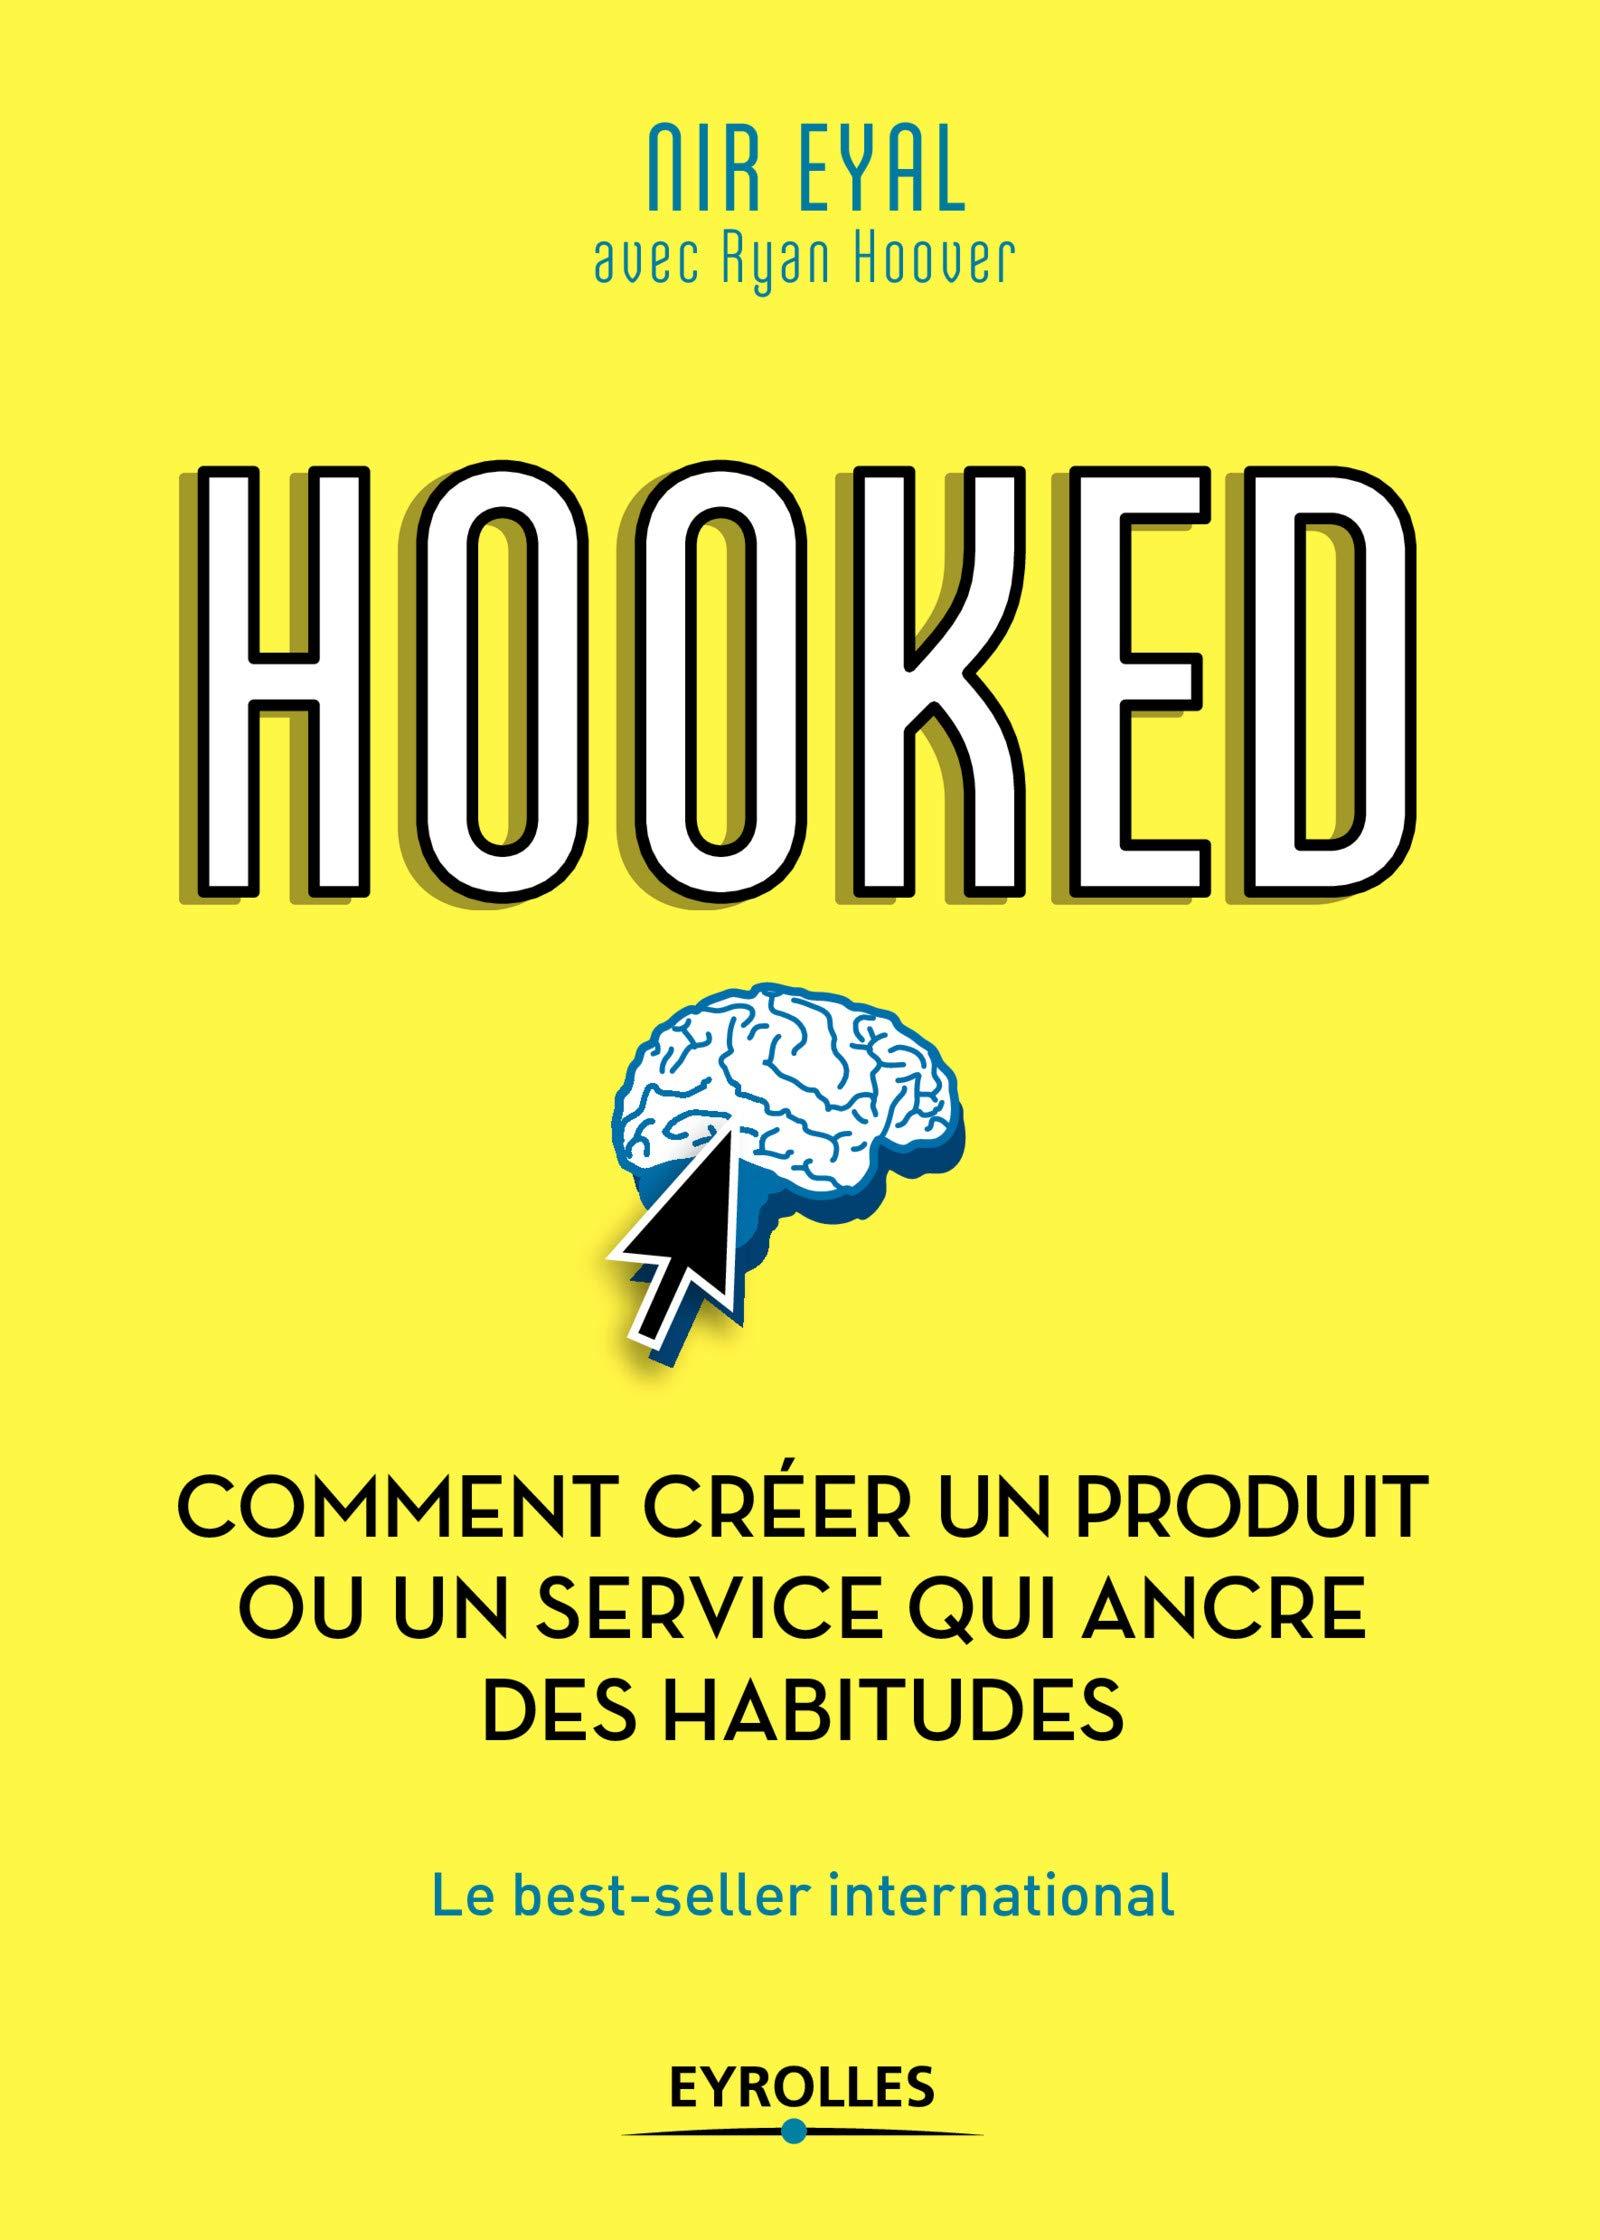 Livres de Neuromarketing - Hooked par Nir Eyal